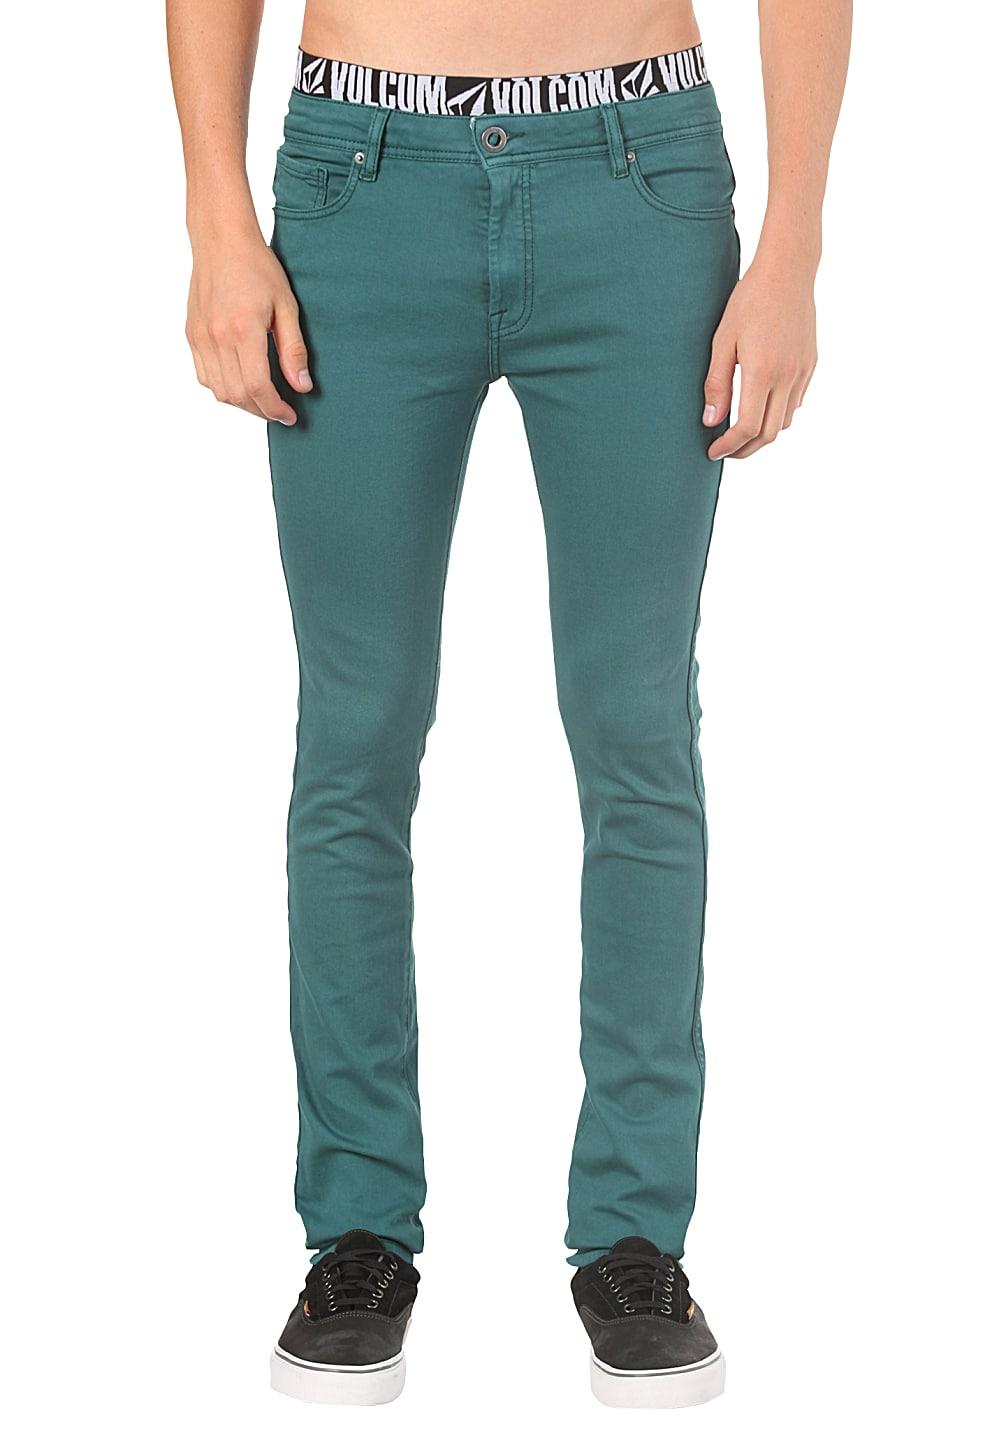 Volcom Dirty Sky - Jeans für Herren blau